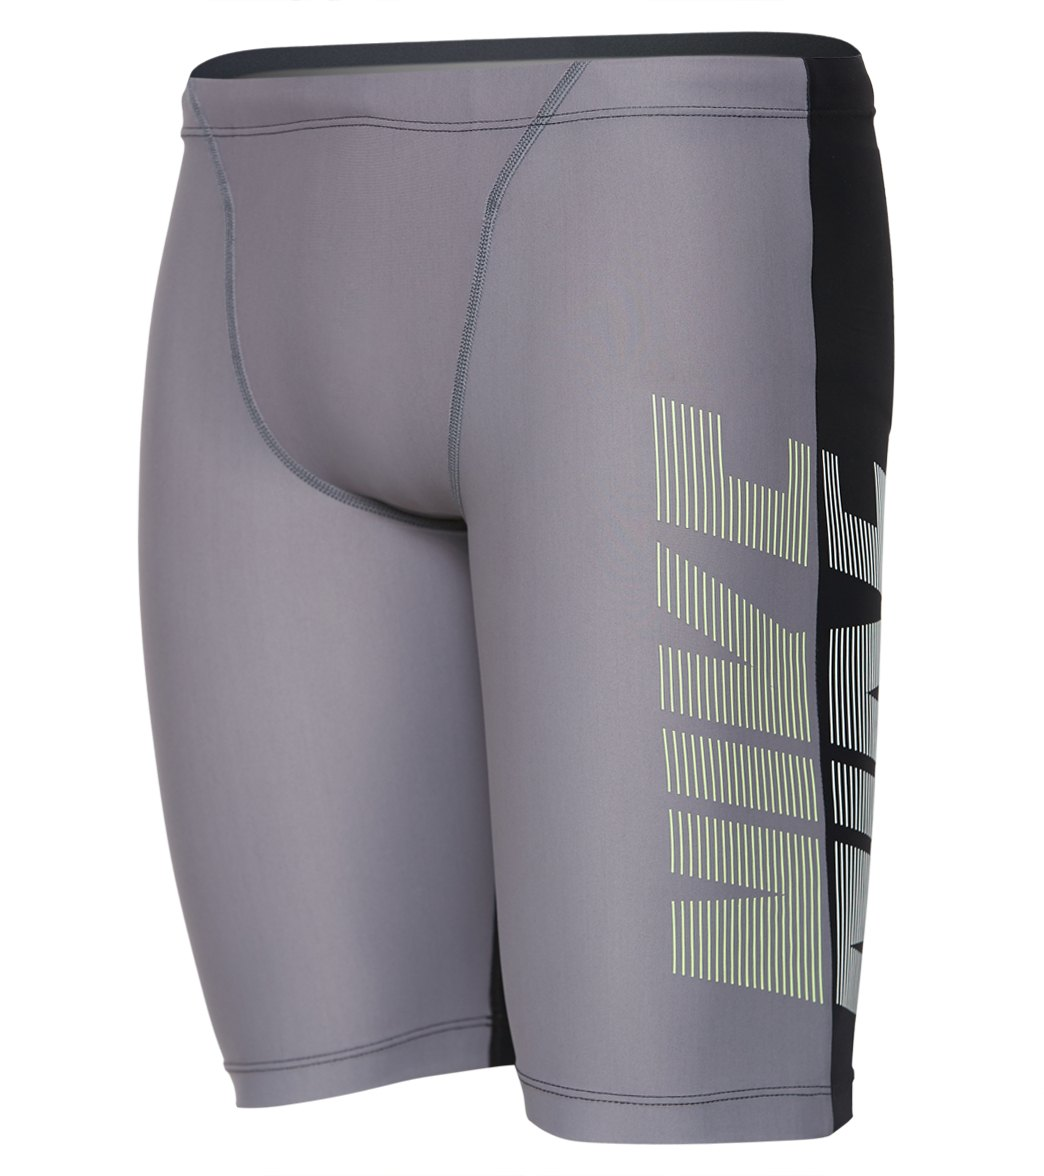 7e6defcee7 Nike Men's Rift Jammer Swimsuit at SwimOutlet.com - Free Shipping